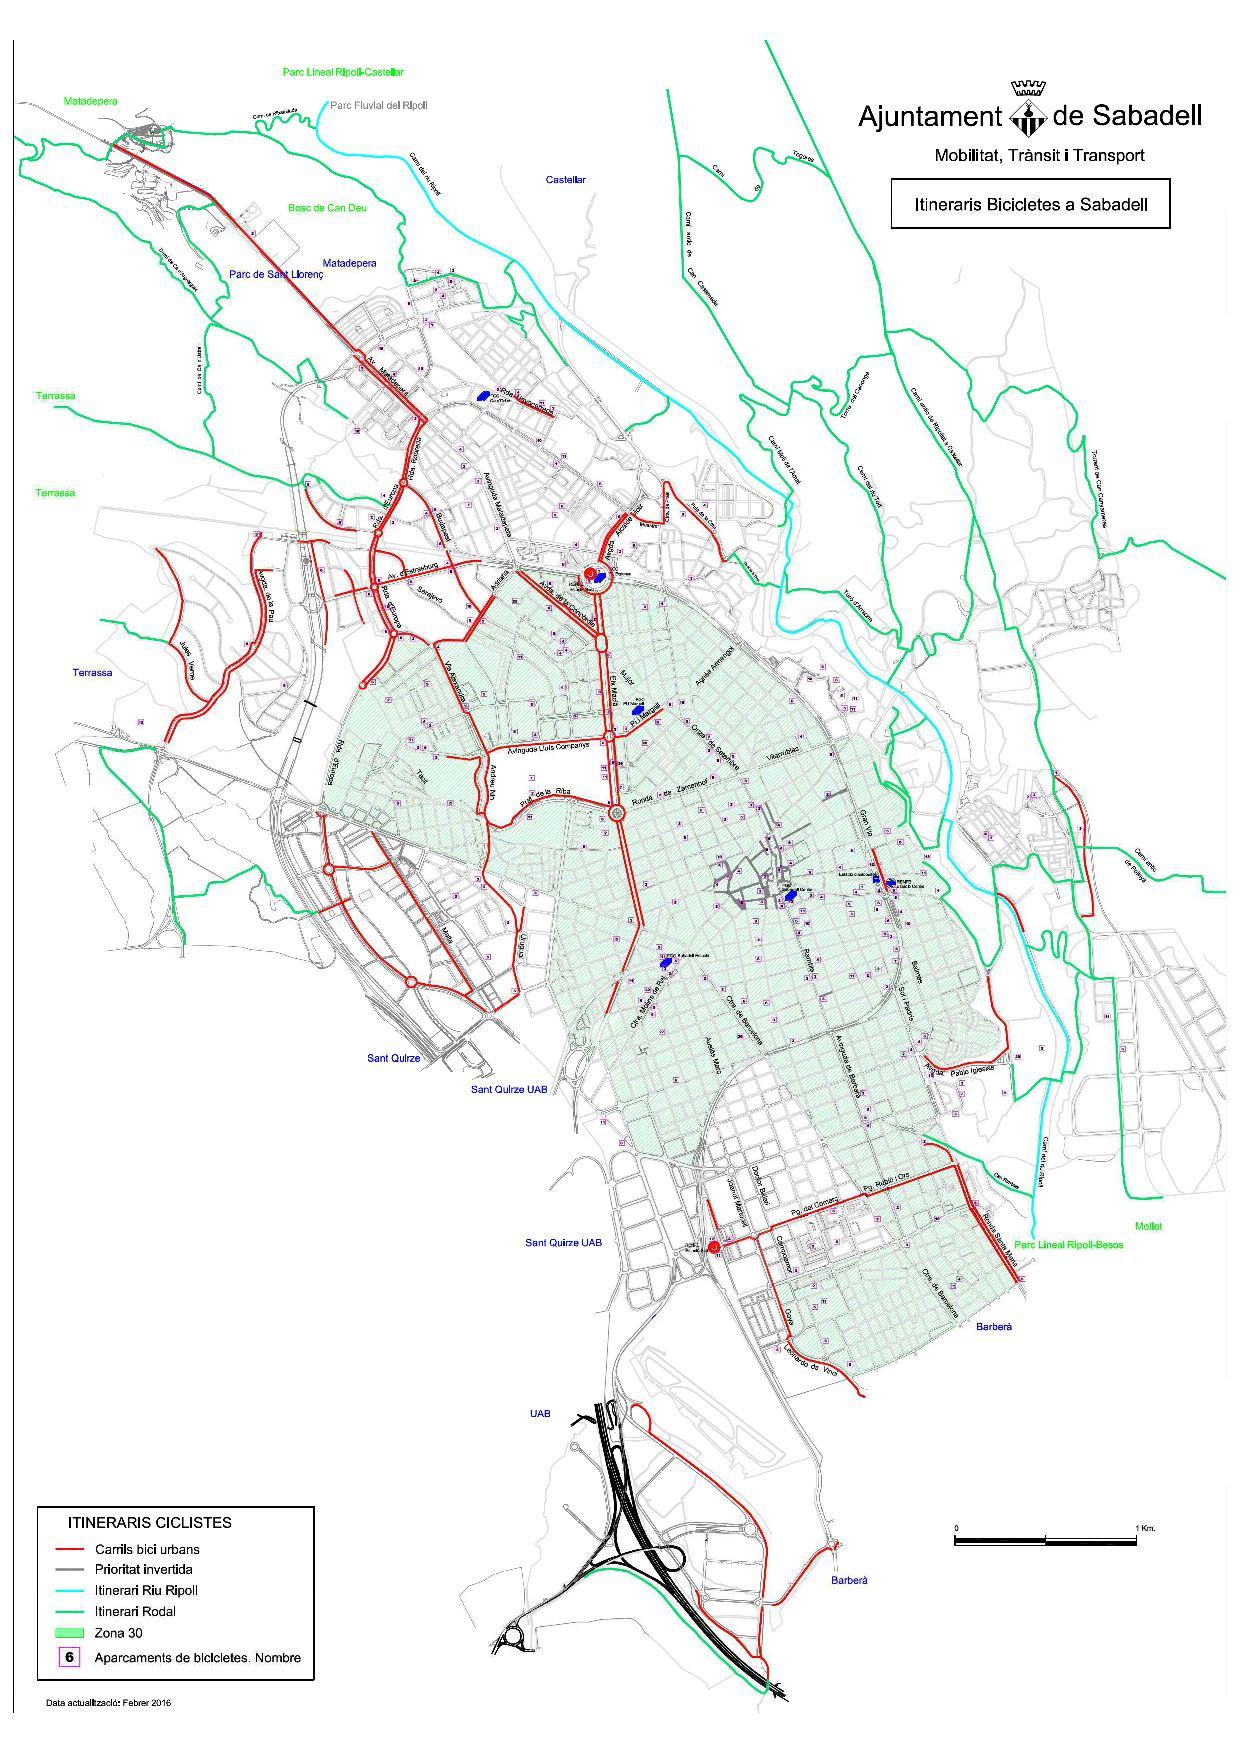 2016 Planol Carril bici  aparcaments JPG